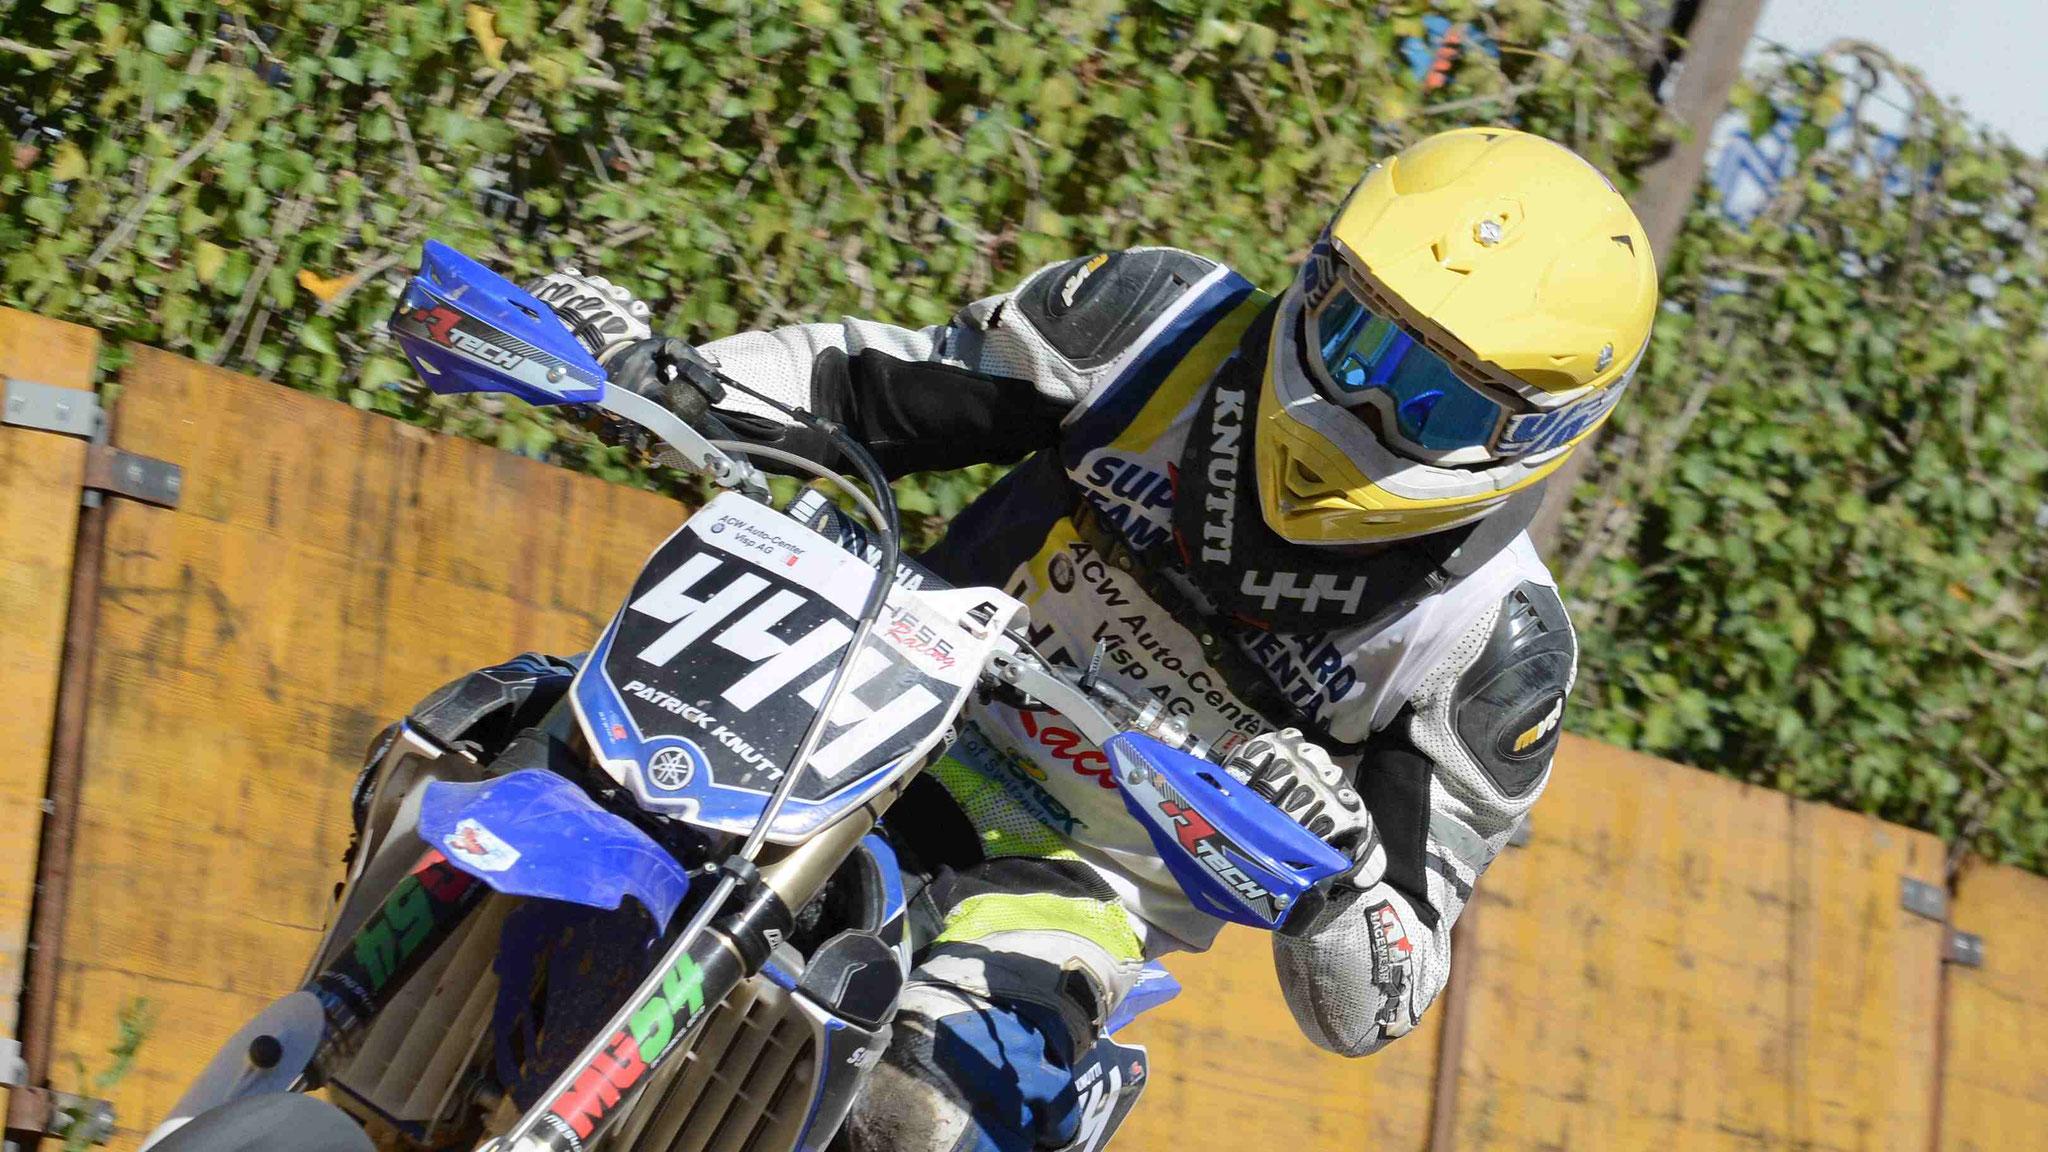 #444 Patrick Knutti - Yamaha